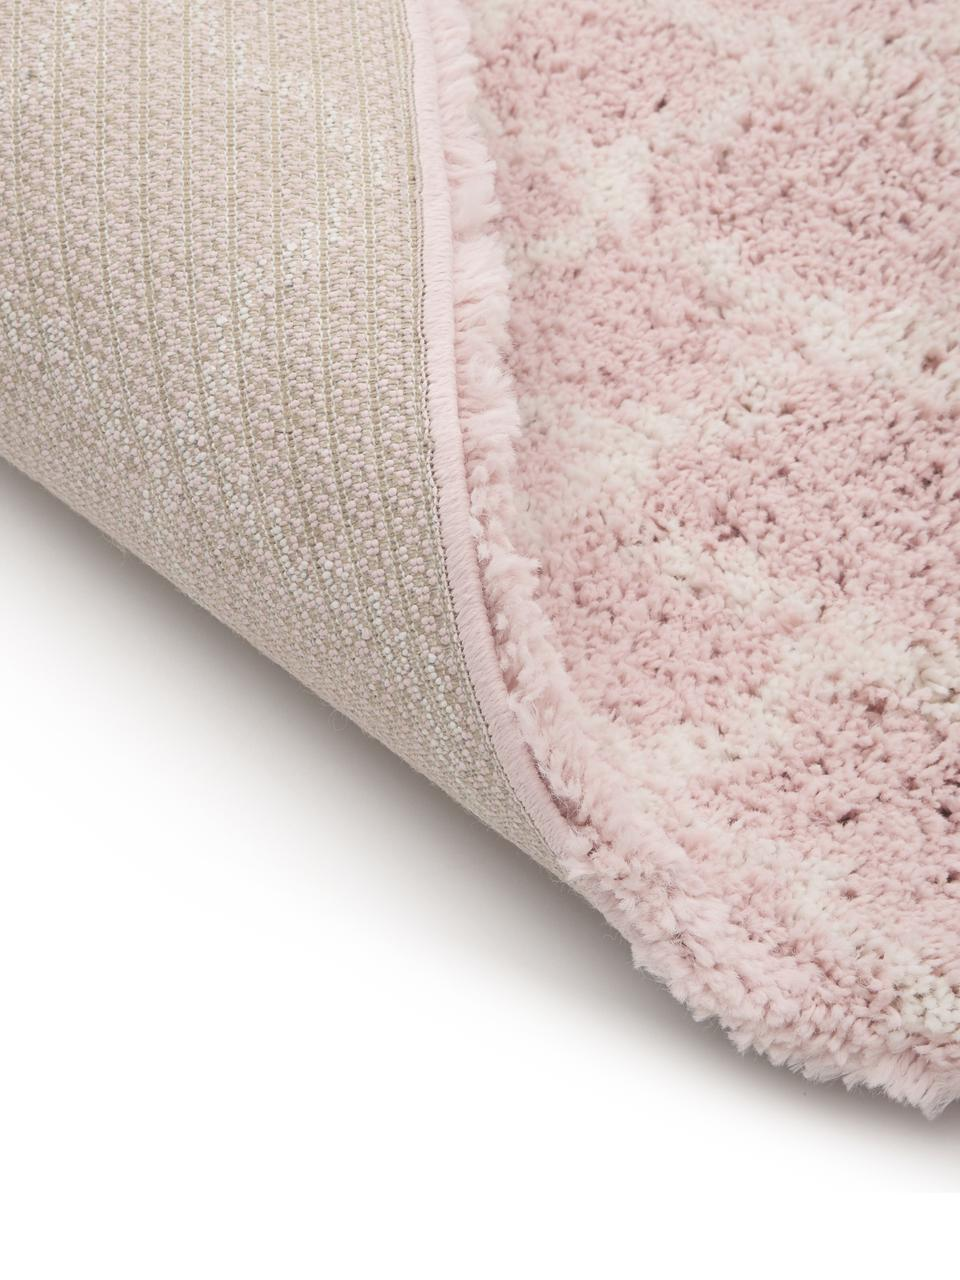 Hochflor-Teppich Mona in Altrosa/Cremeweiß, Flor: 100% Polypropylen, Altrosa, Cremeweiß, B 300 x L 400 cm (Größe XL)